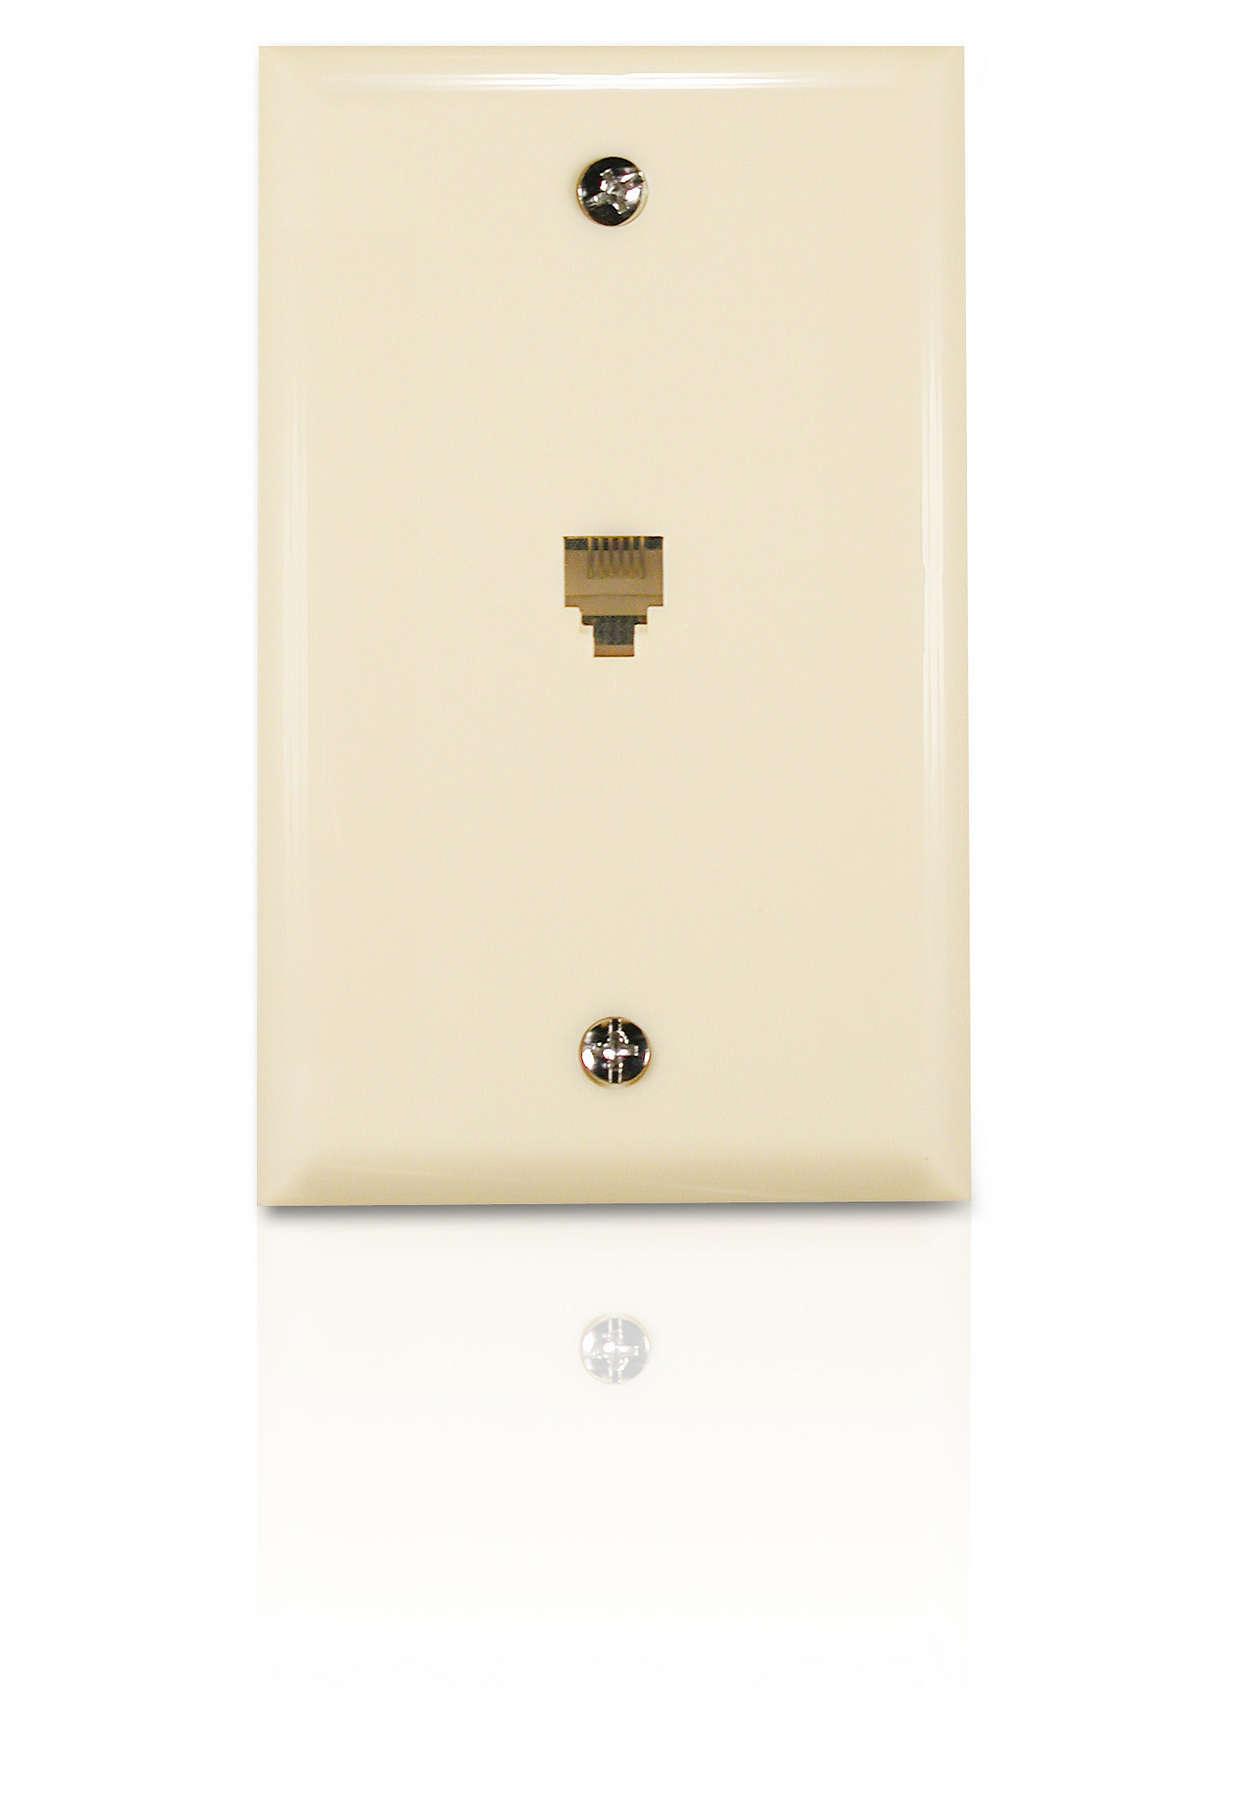 Create a phone jack